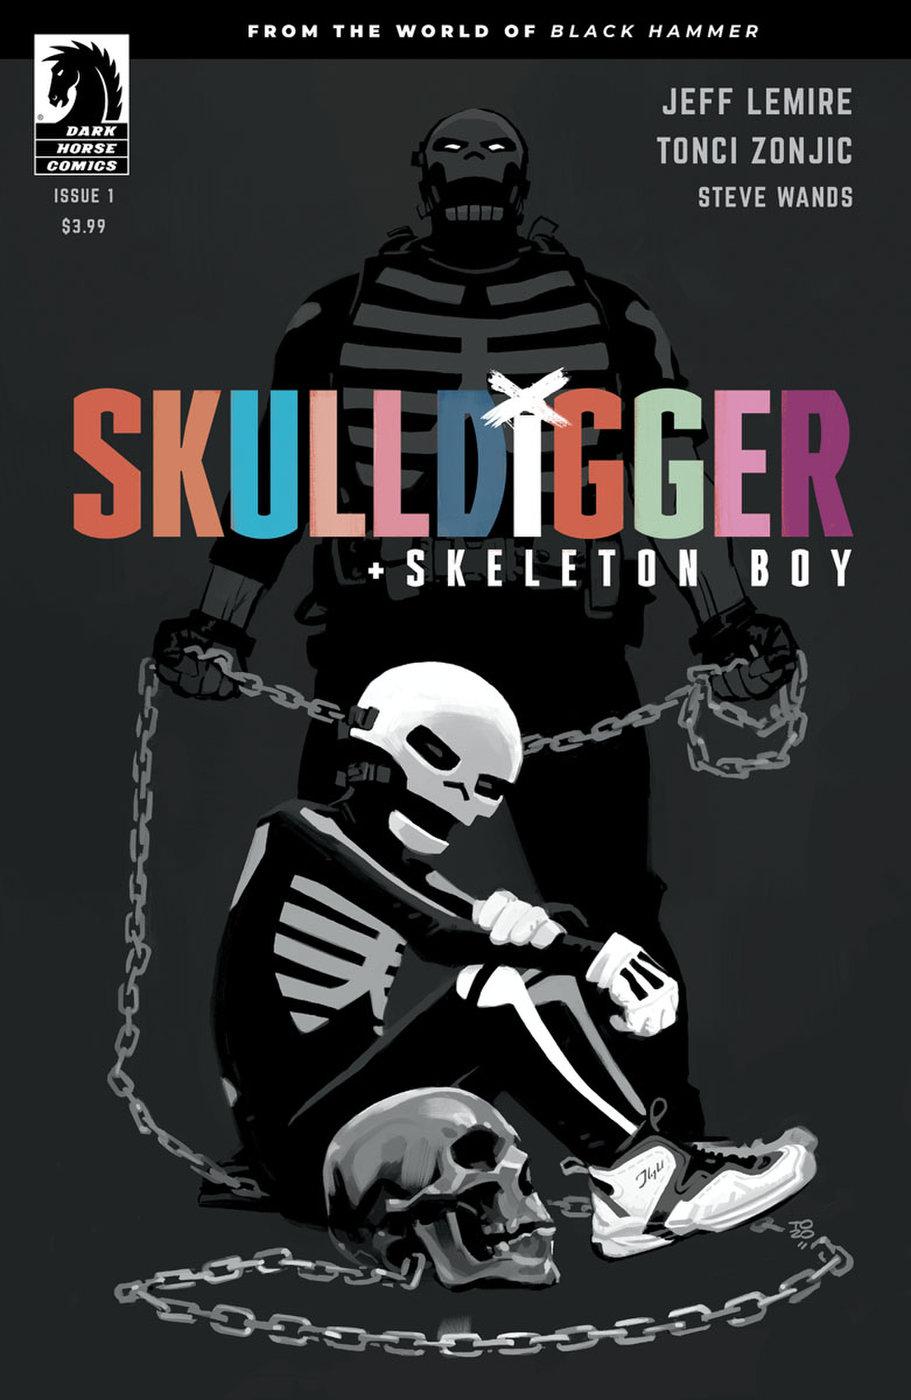 Skulldigger + Skeleton Boy #1, copertina di Tonci Zonjic